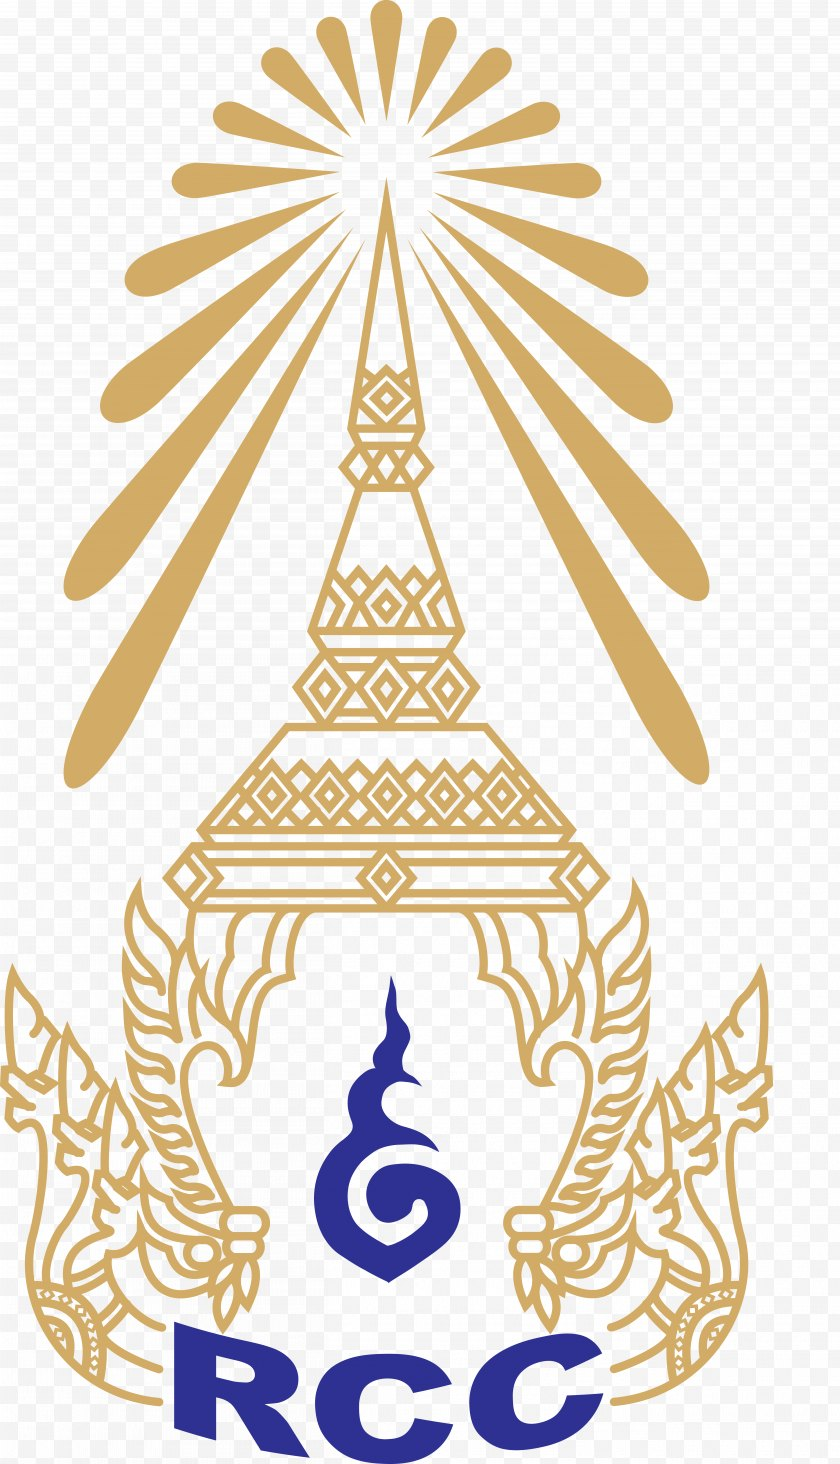 Thaksin University - Srinakharinwirot Nakhon Pathom Rajabhat Education - School Free PNG